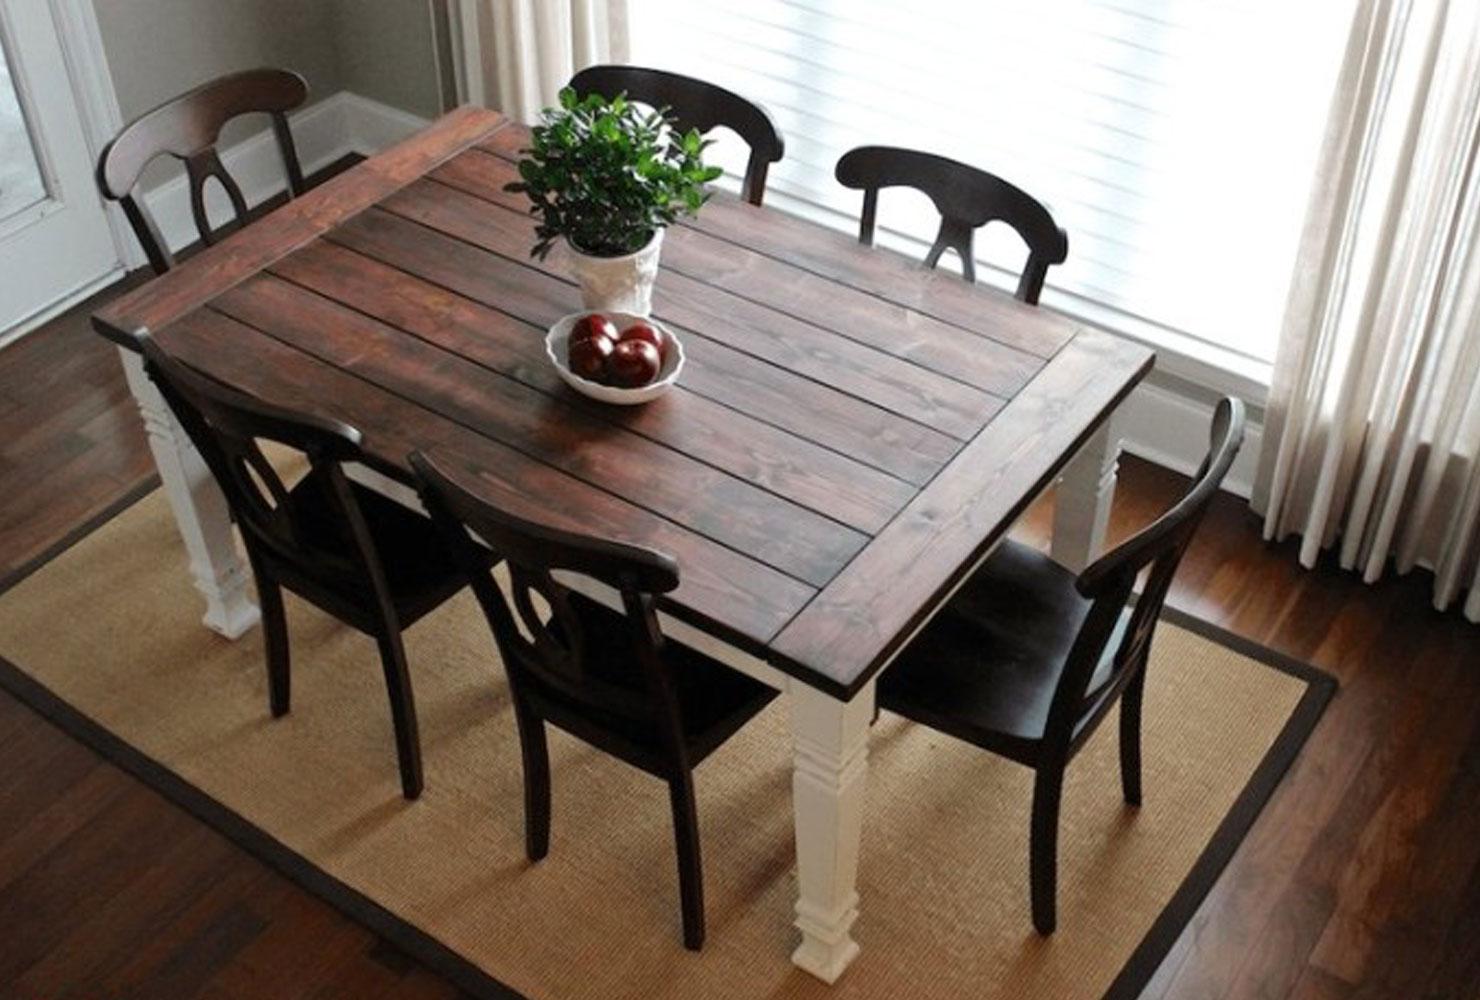 Reclaimed Wood Furniture Decorative Accessory Ideas